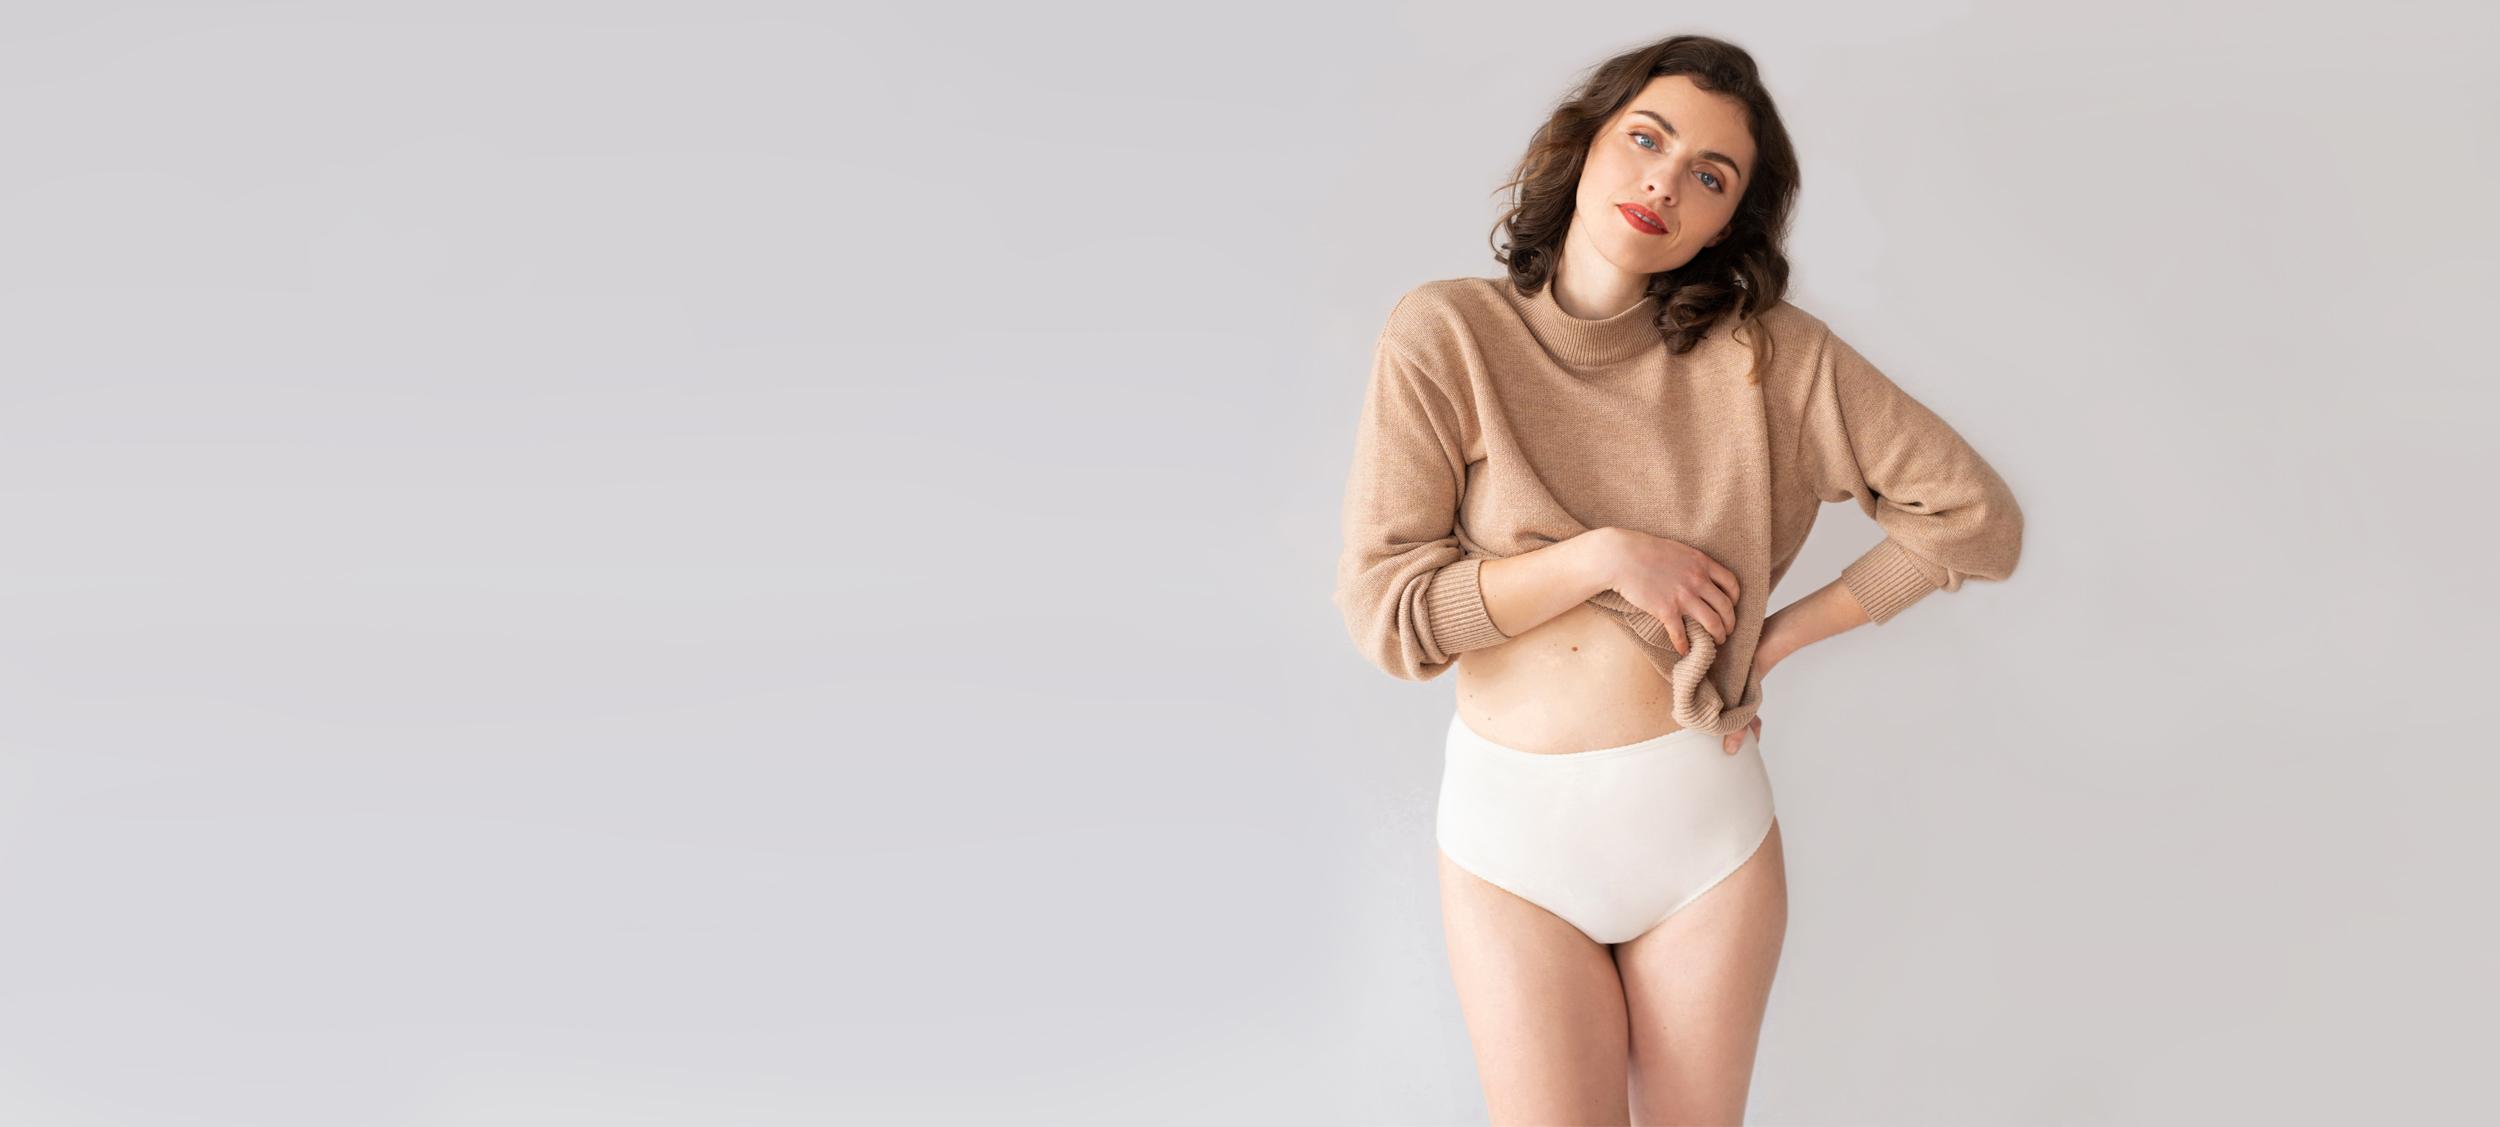 Naturálna spodná bielizeň značky Créeme ideálna pre citlivú pokožku